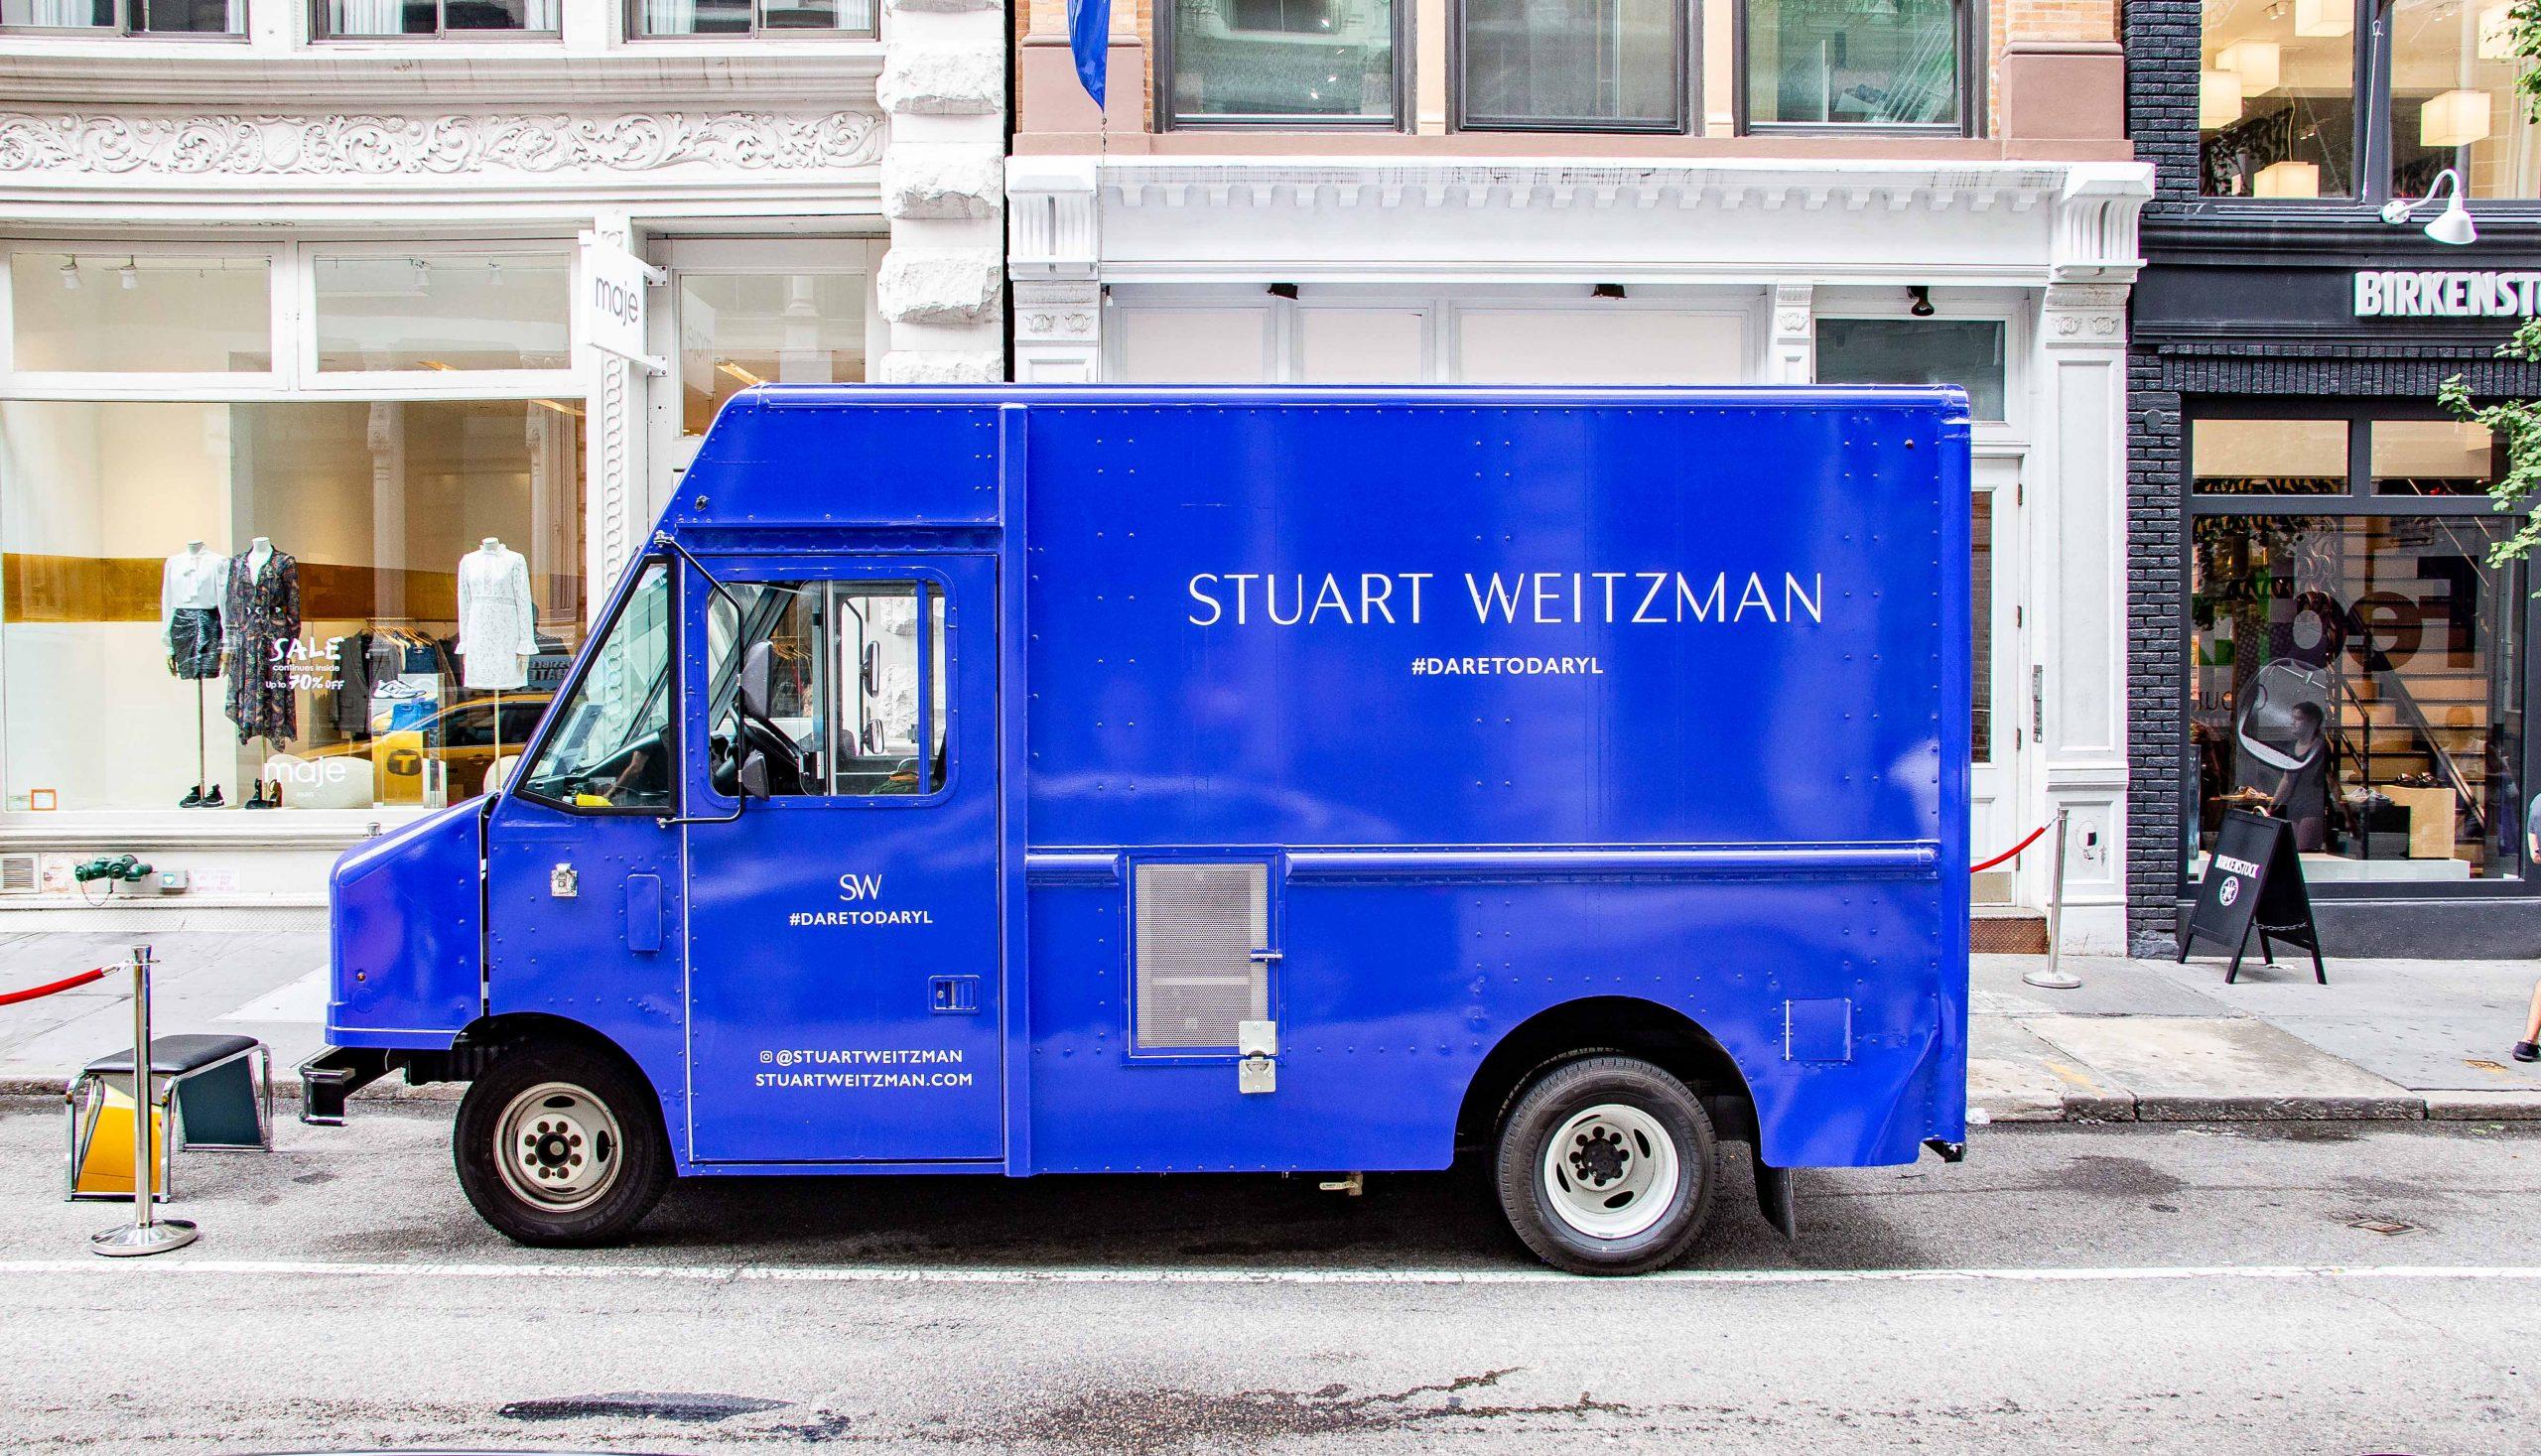 Branded food truck